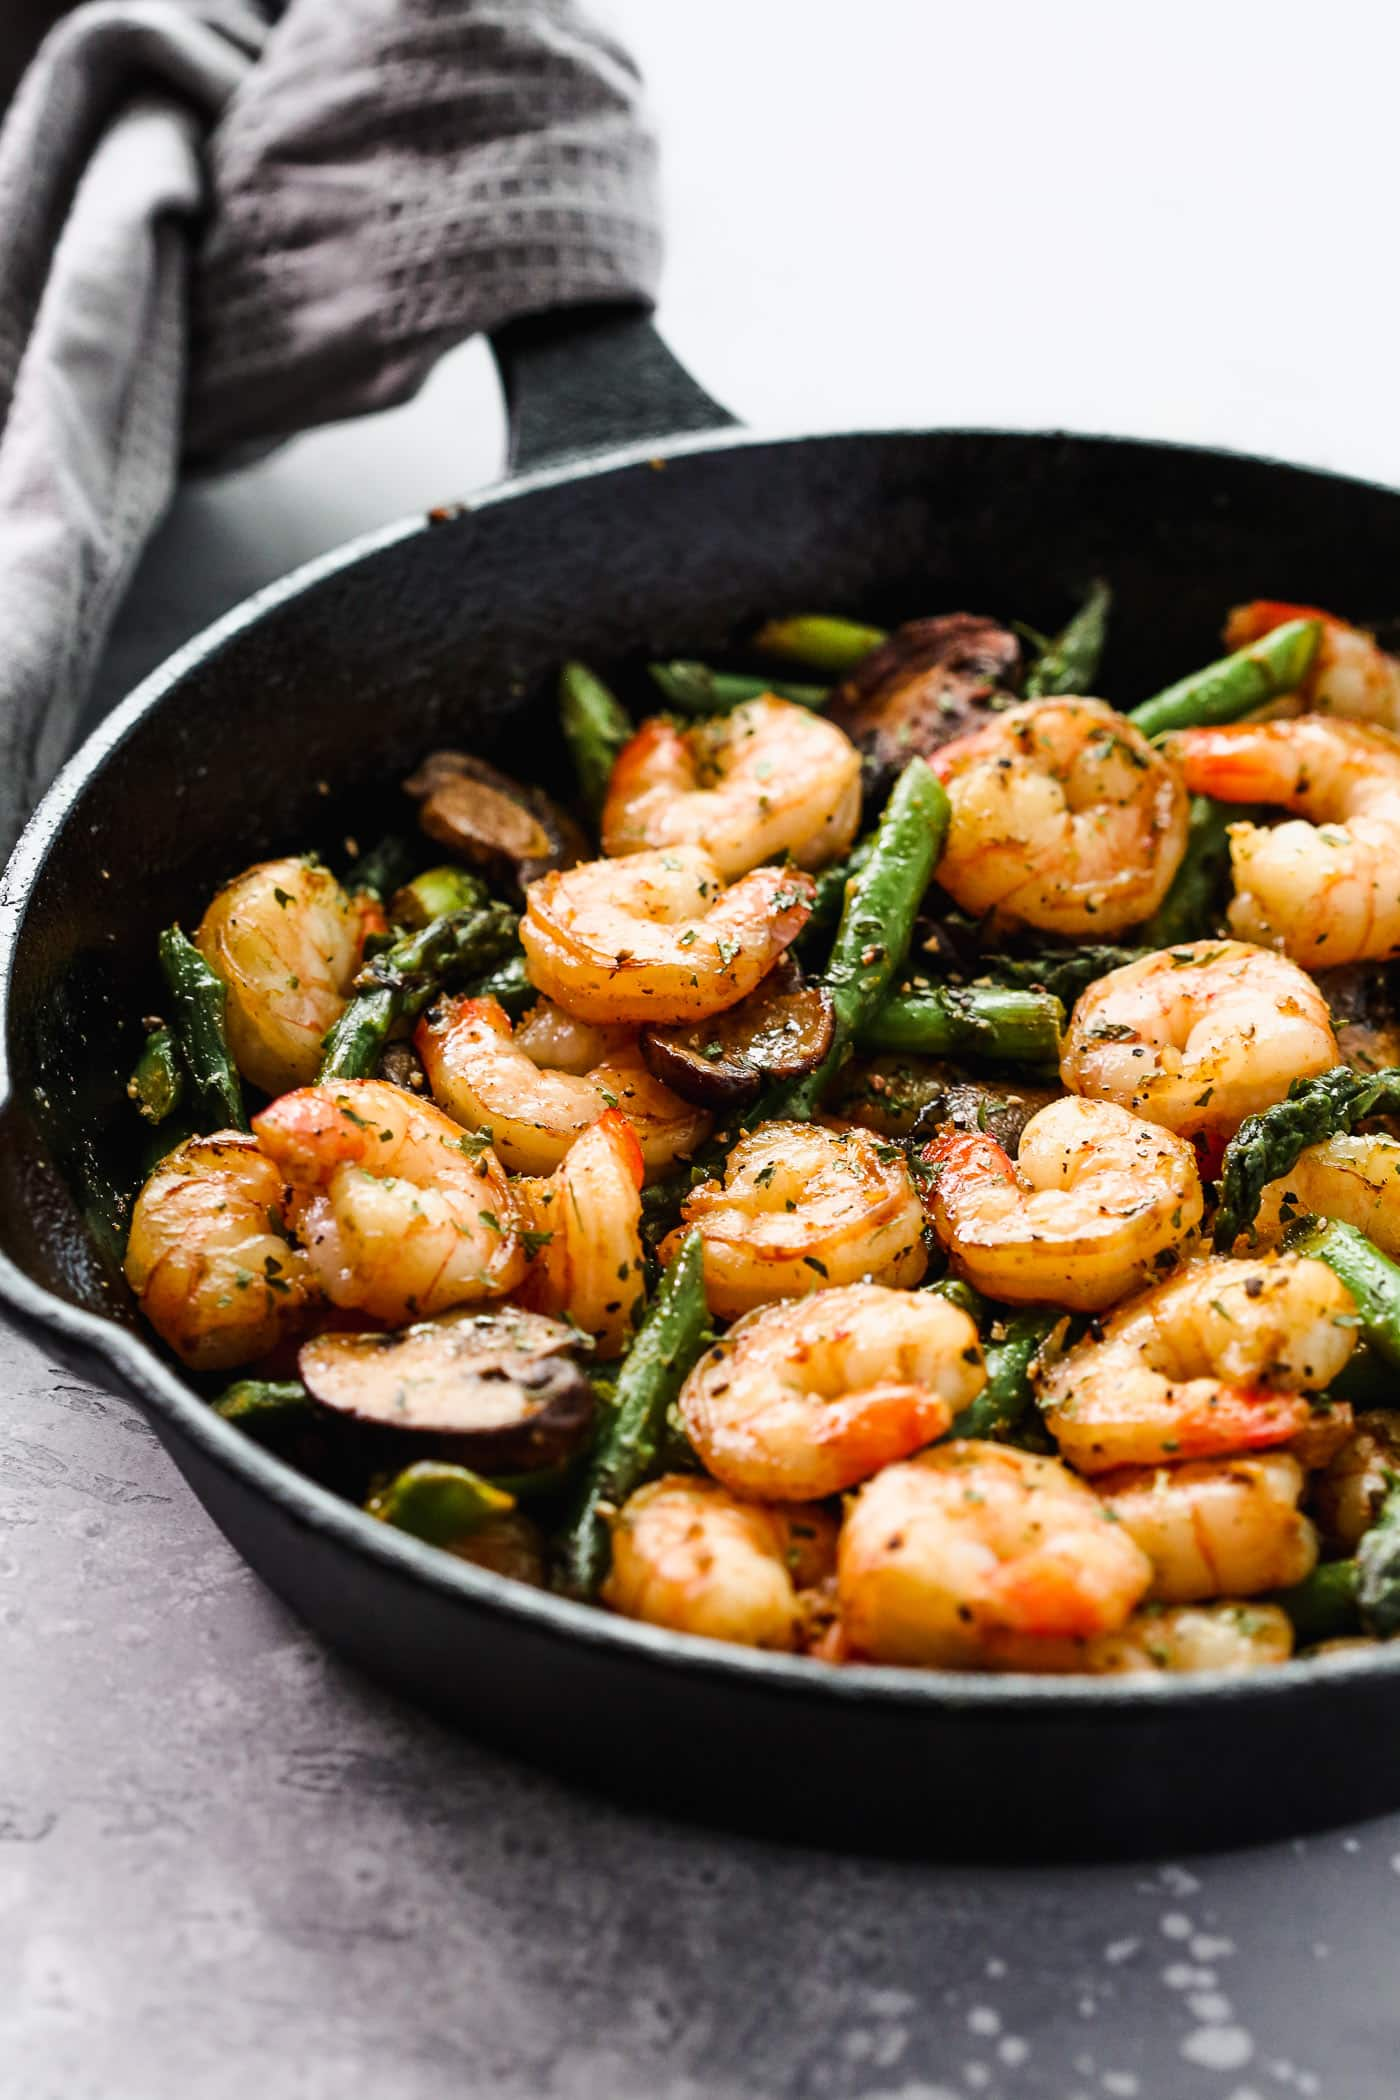 2. Garlic Shrimp with Mushroom and Asparagus